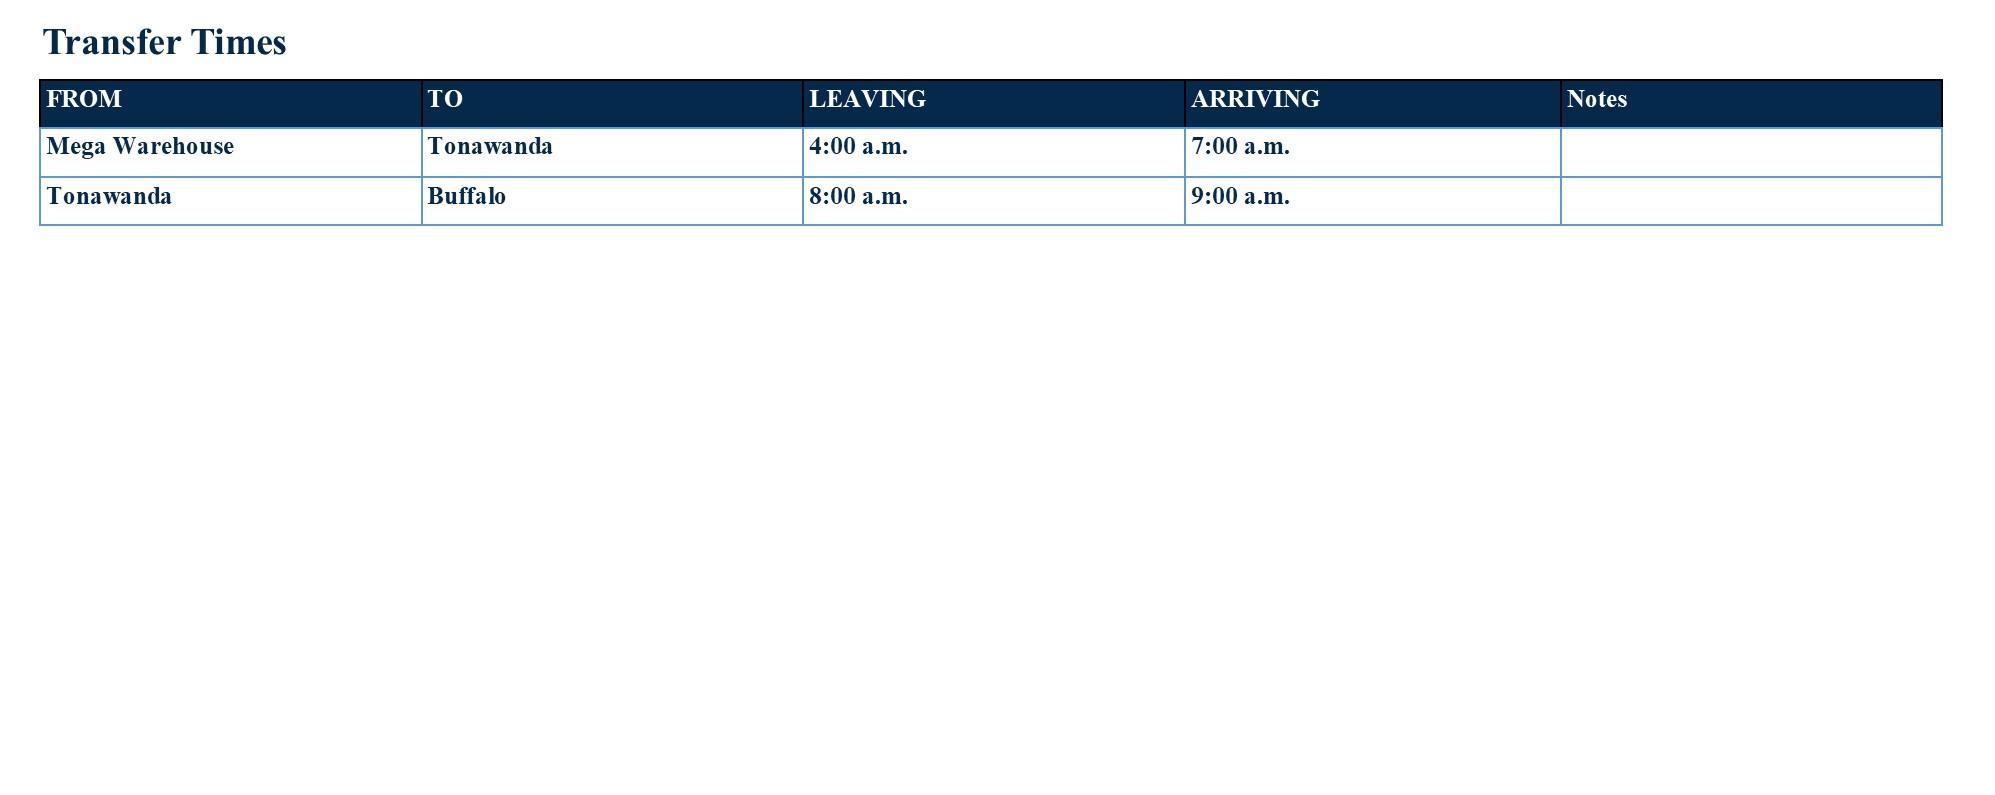 Rochester - Transfers 3.22.21